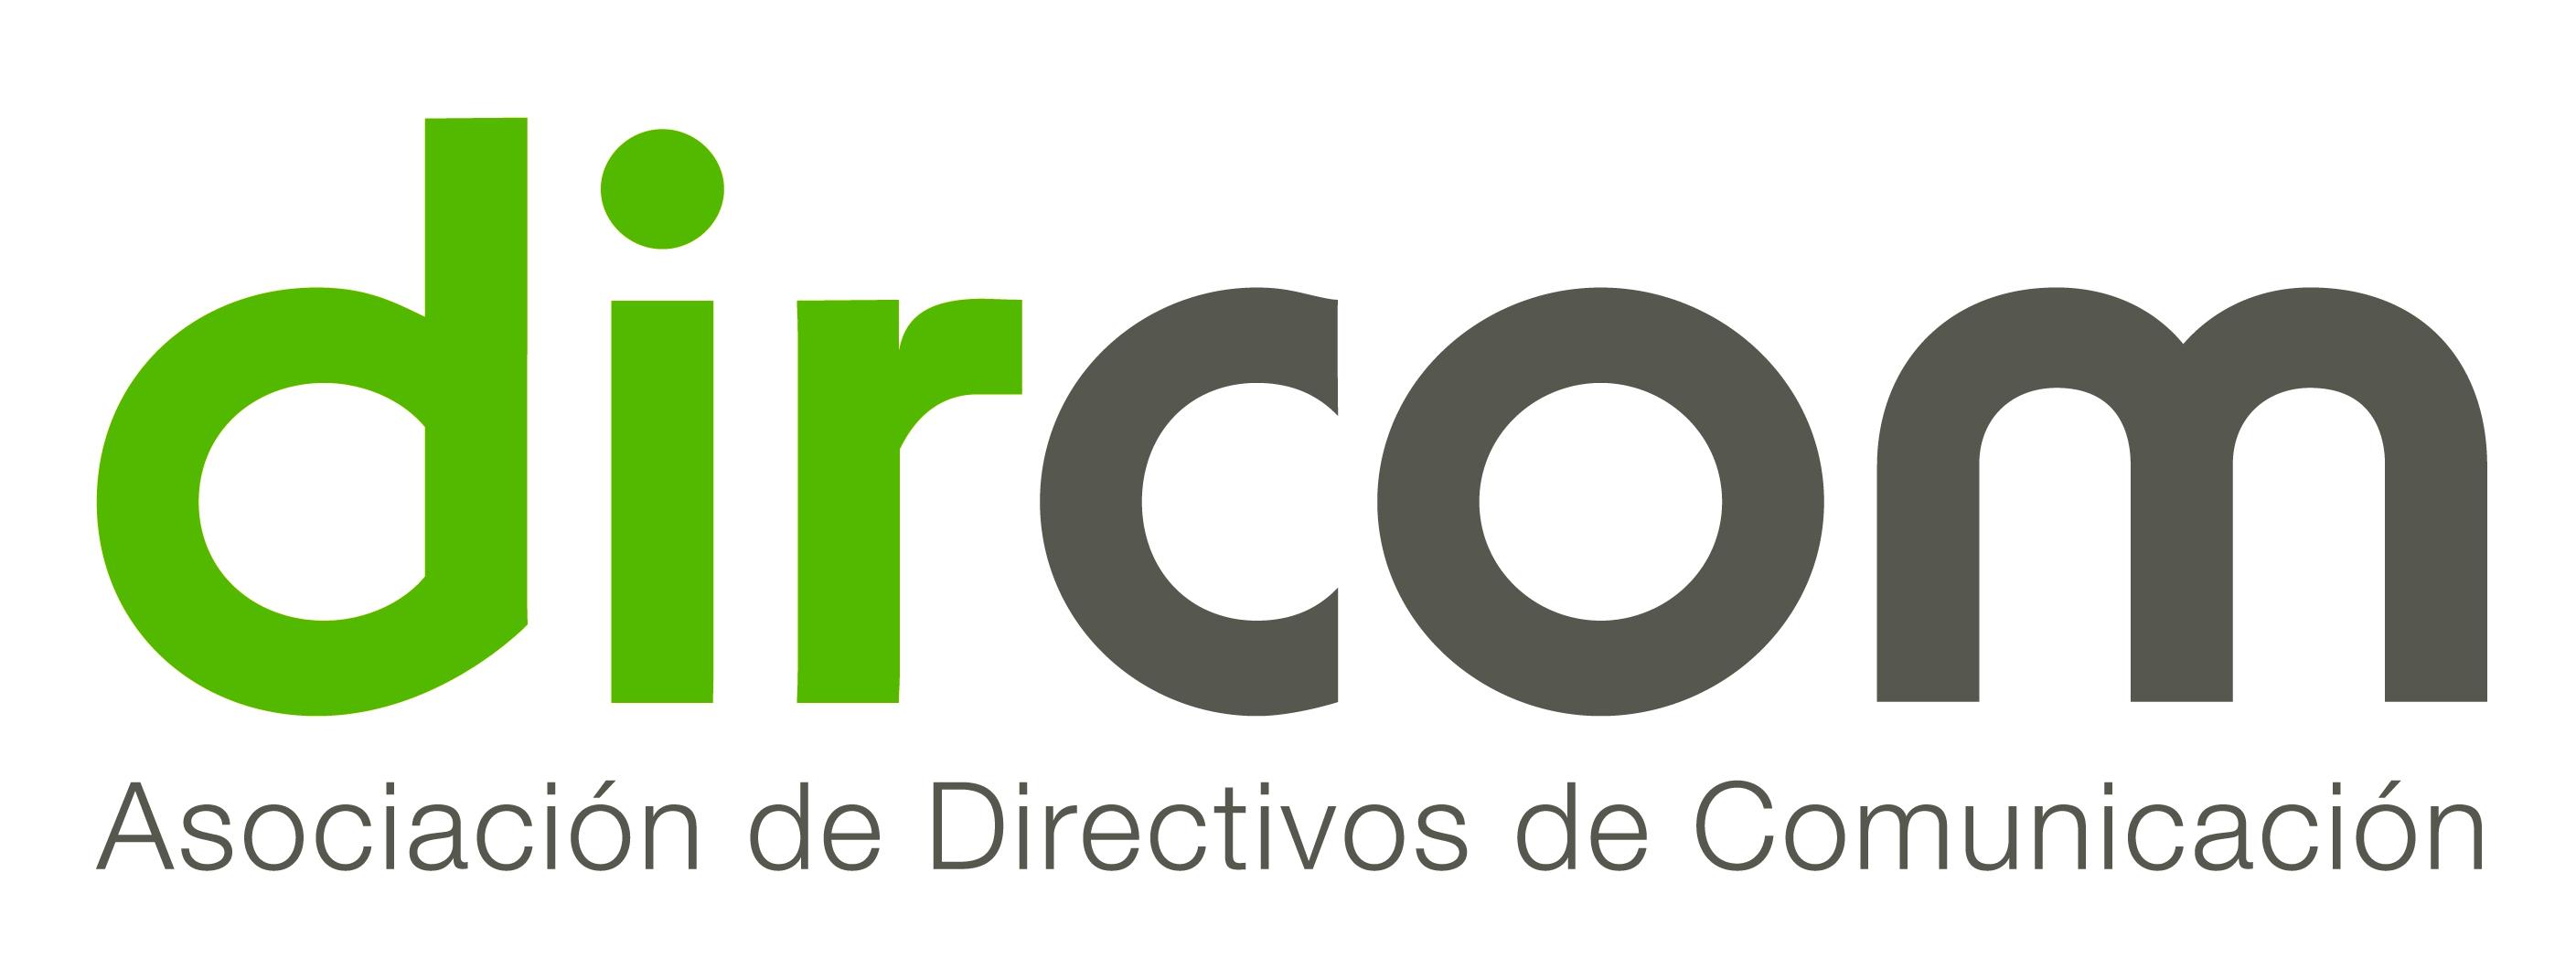 DESCUENTO ASOCIADOS DIRCOM